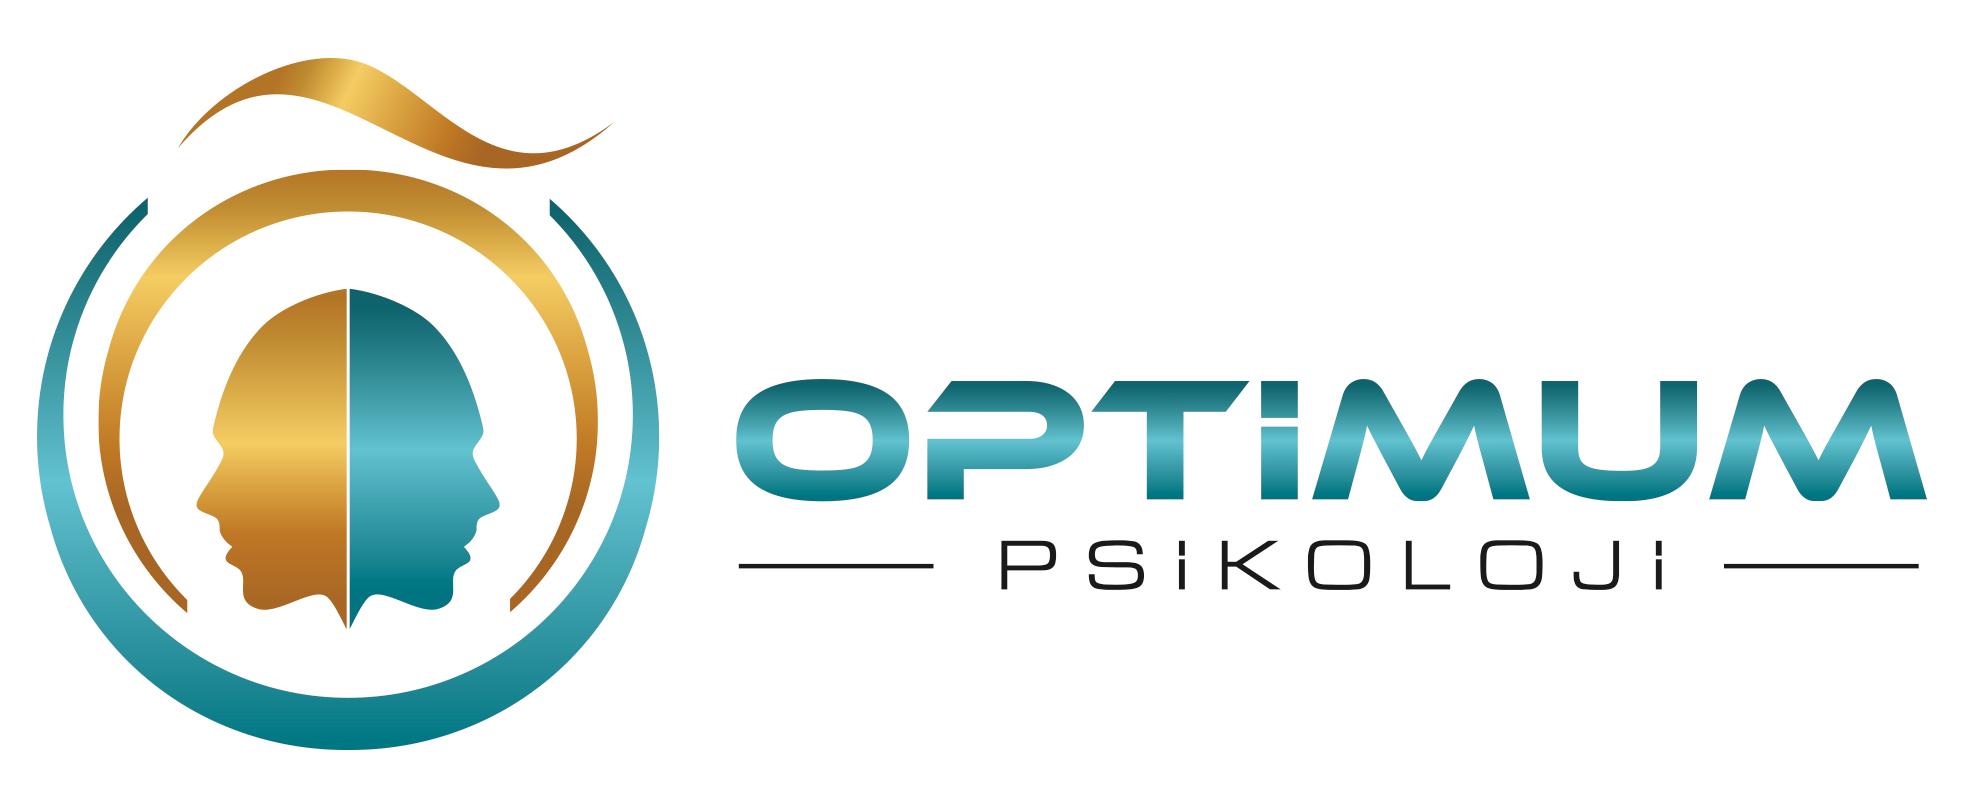 Konya Psikolog | Konya Cinsel Terapi | EMDR : www.optimumpsikoloji.com